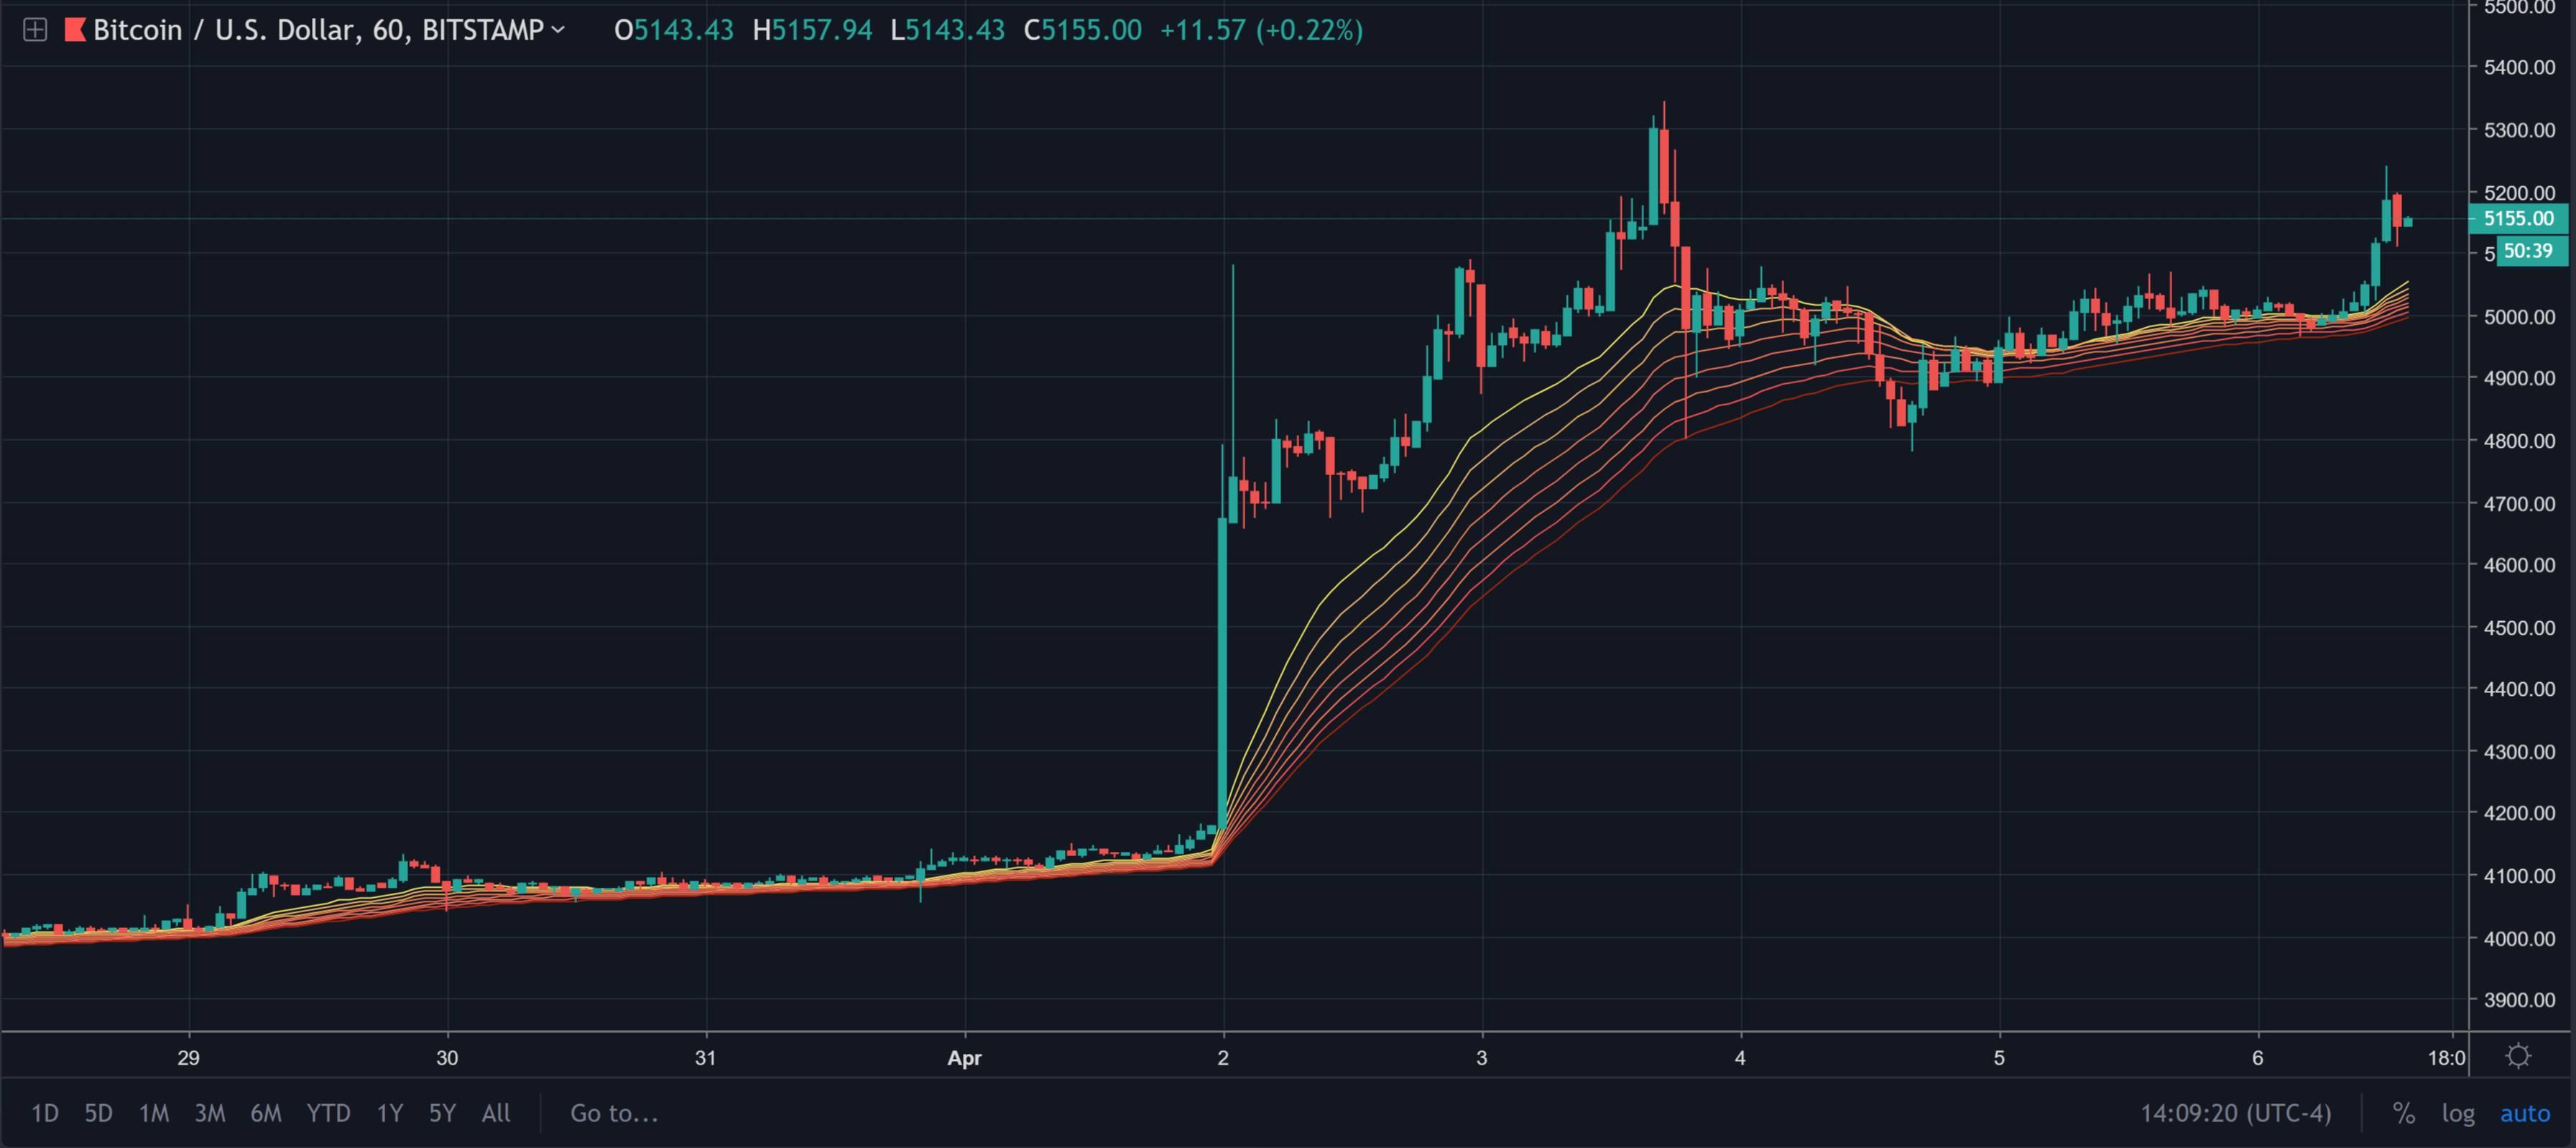 i bullcoin di bitcoin si presentano sabato spingono indietro i btc sopra 5100 1 - I Bullcoin di Bitcoin si presentano sabato, spingono indietro i BTC sopra $ 5100